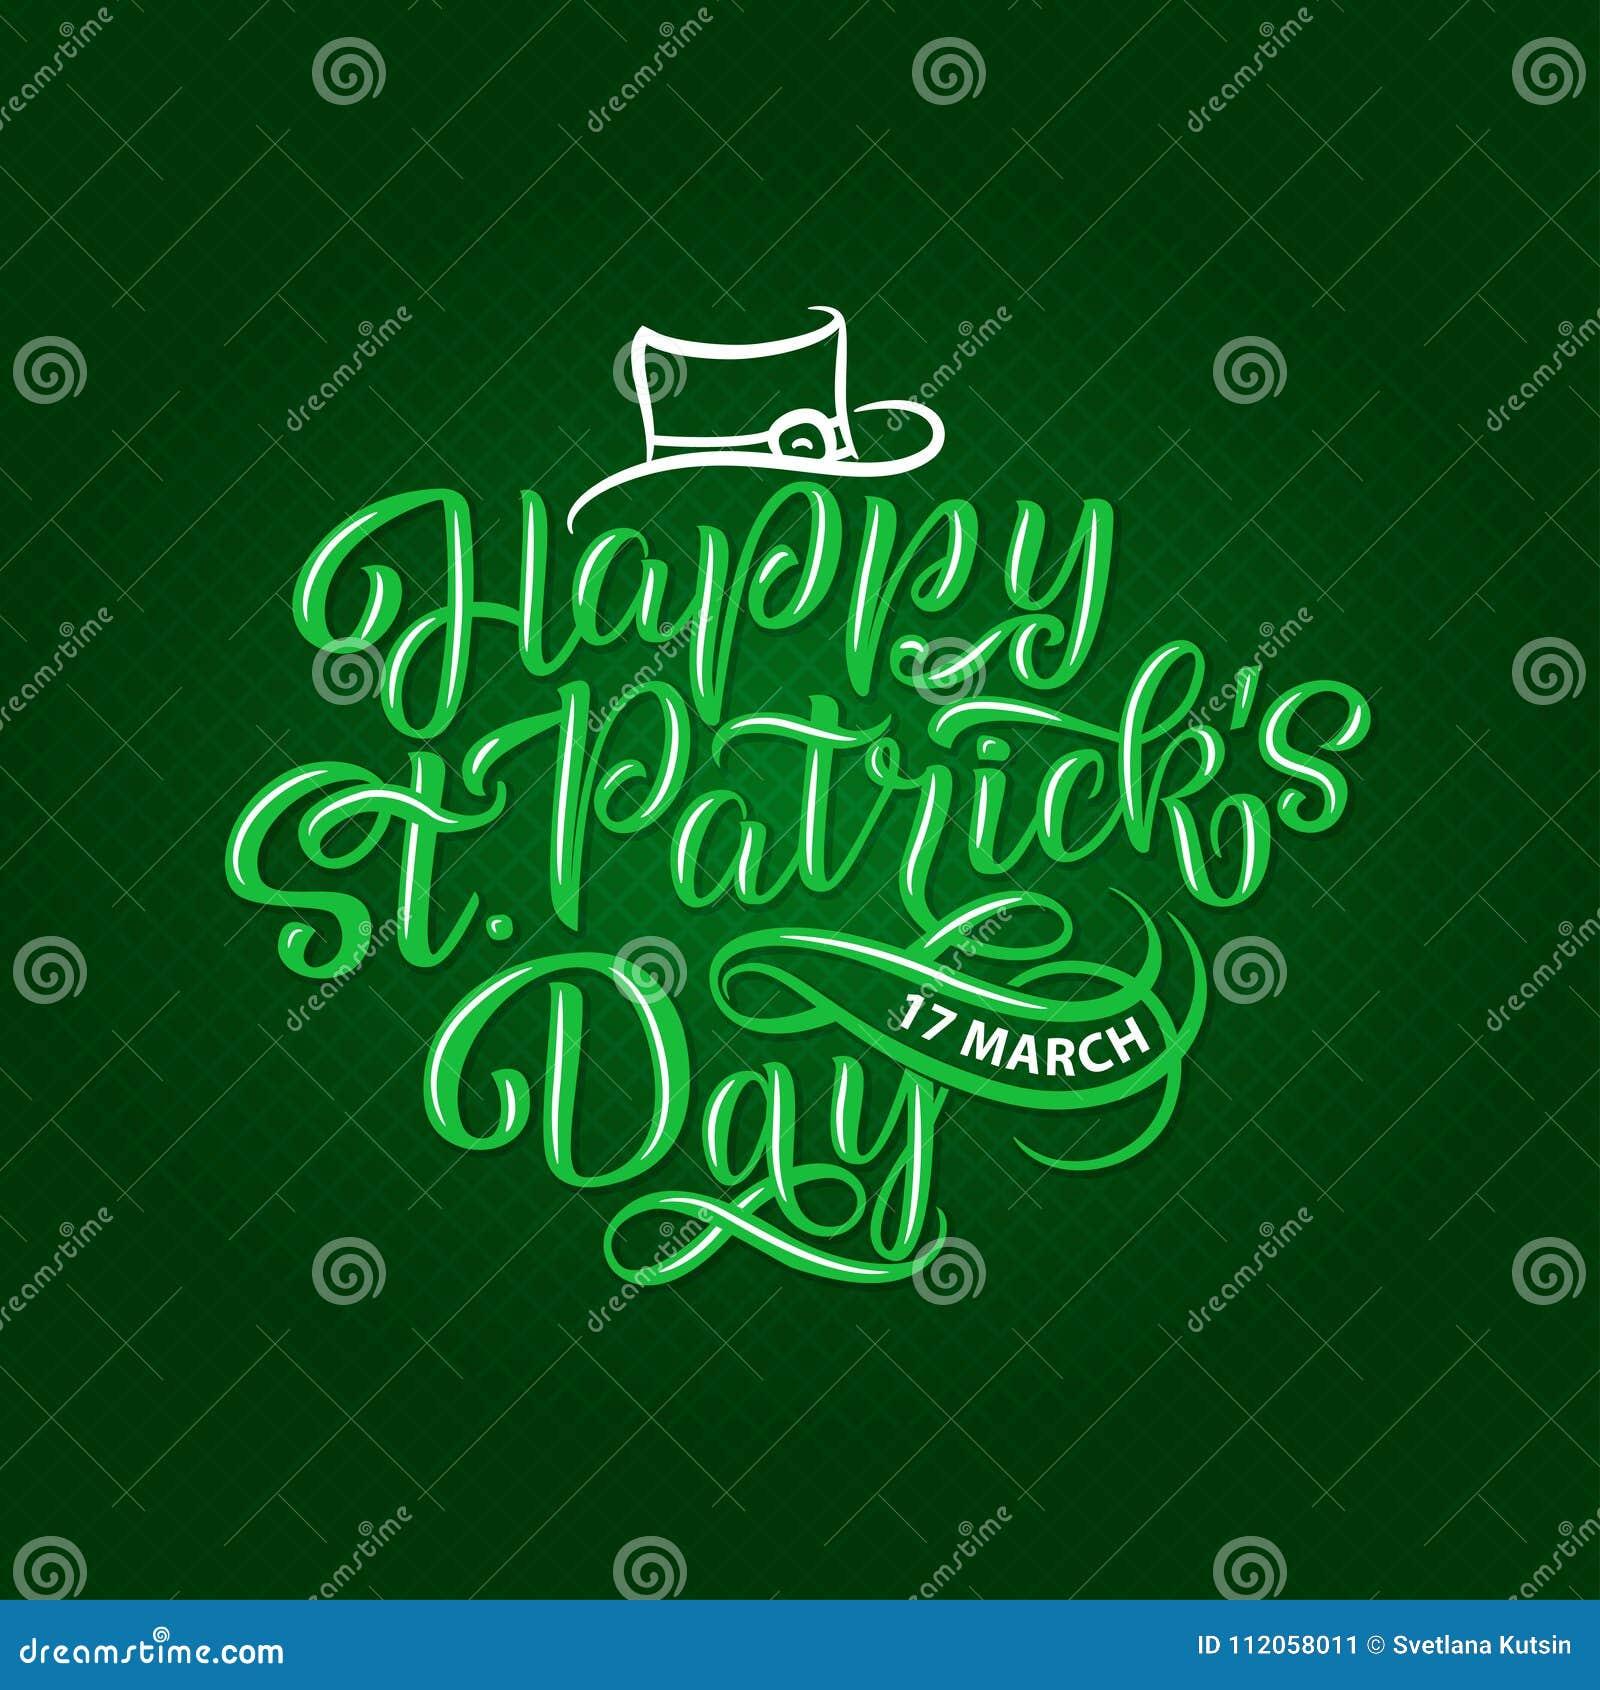 Vector Illustration Of Happy Saint Patrick S Day Logotype Hand